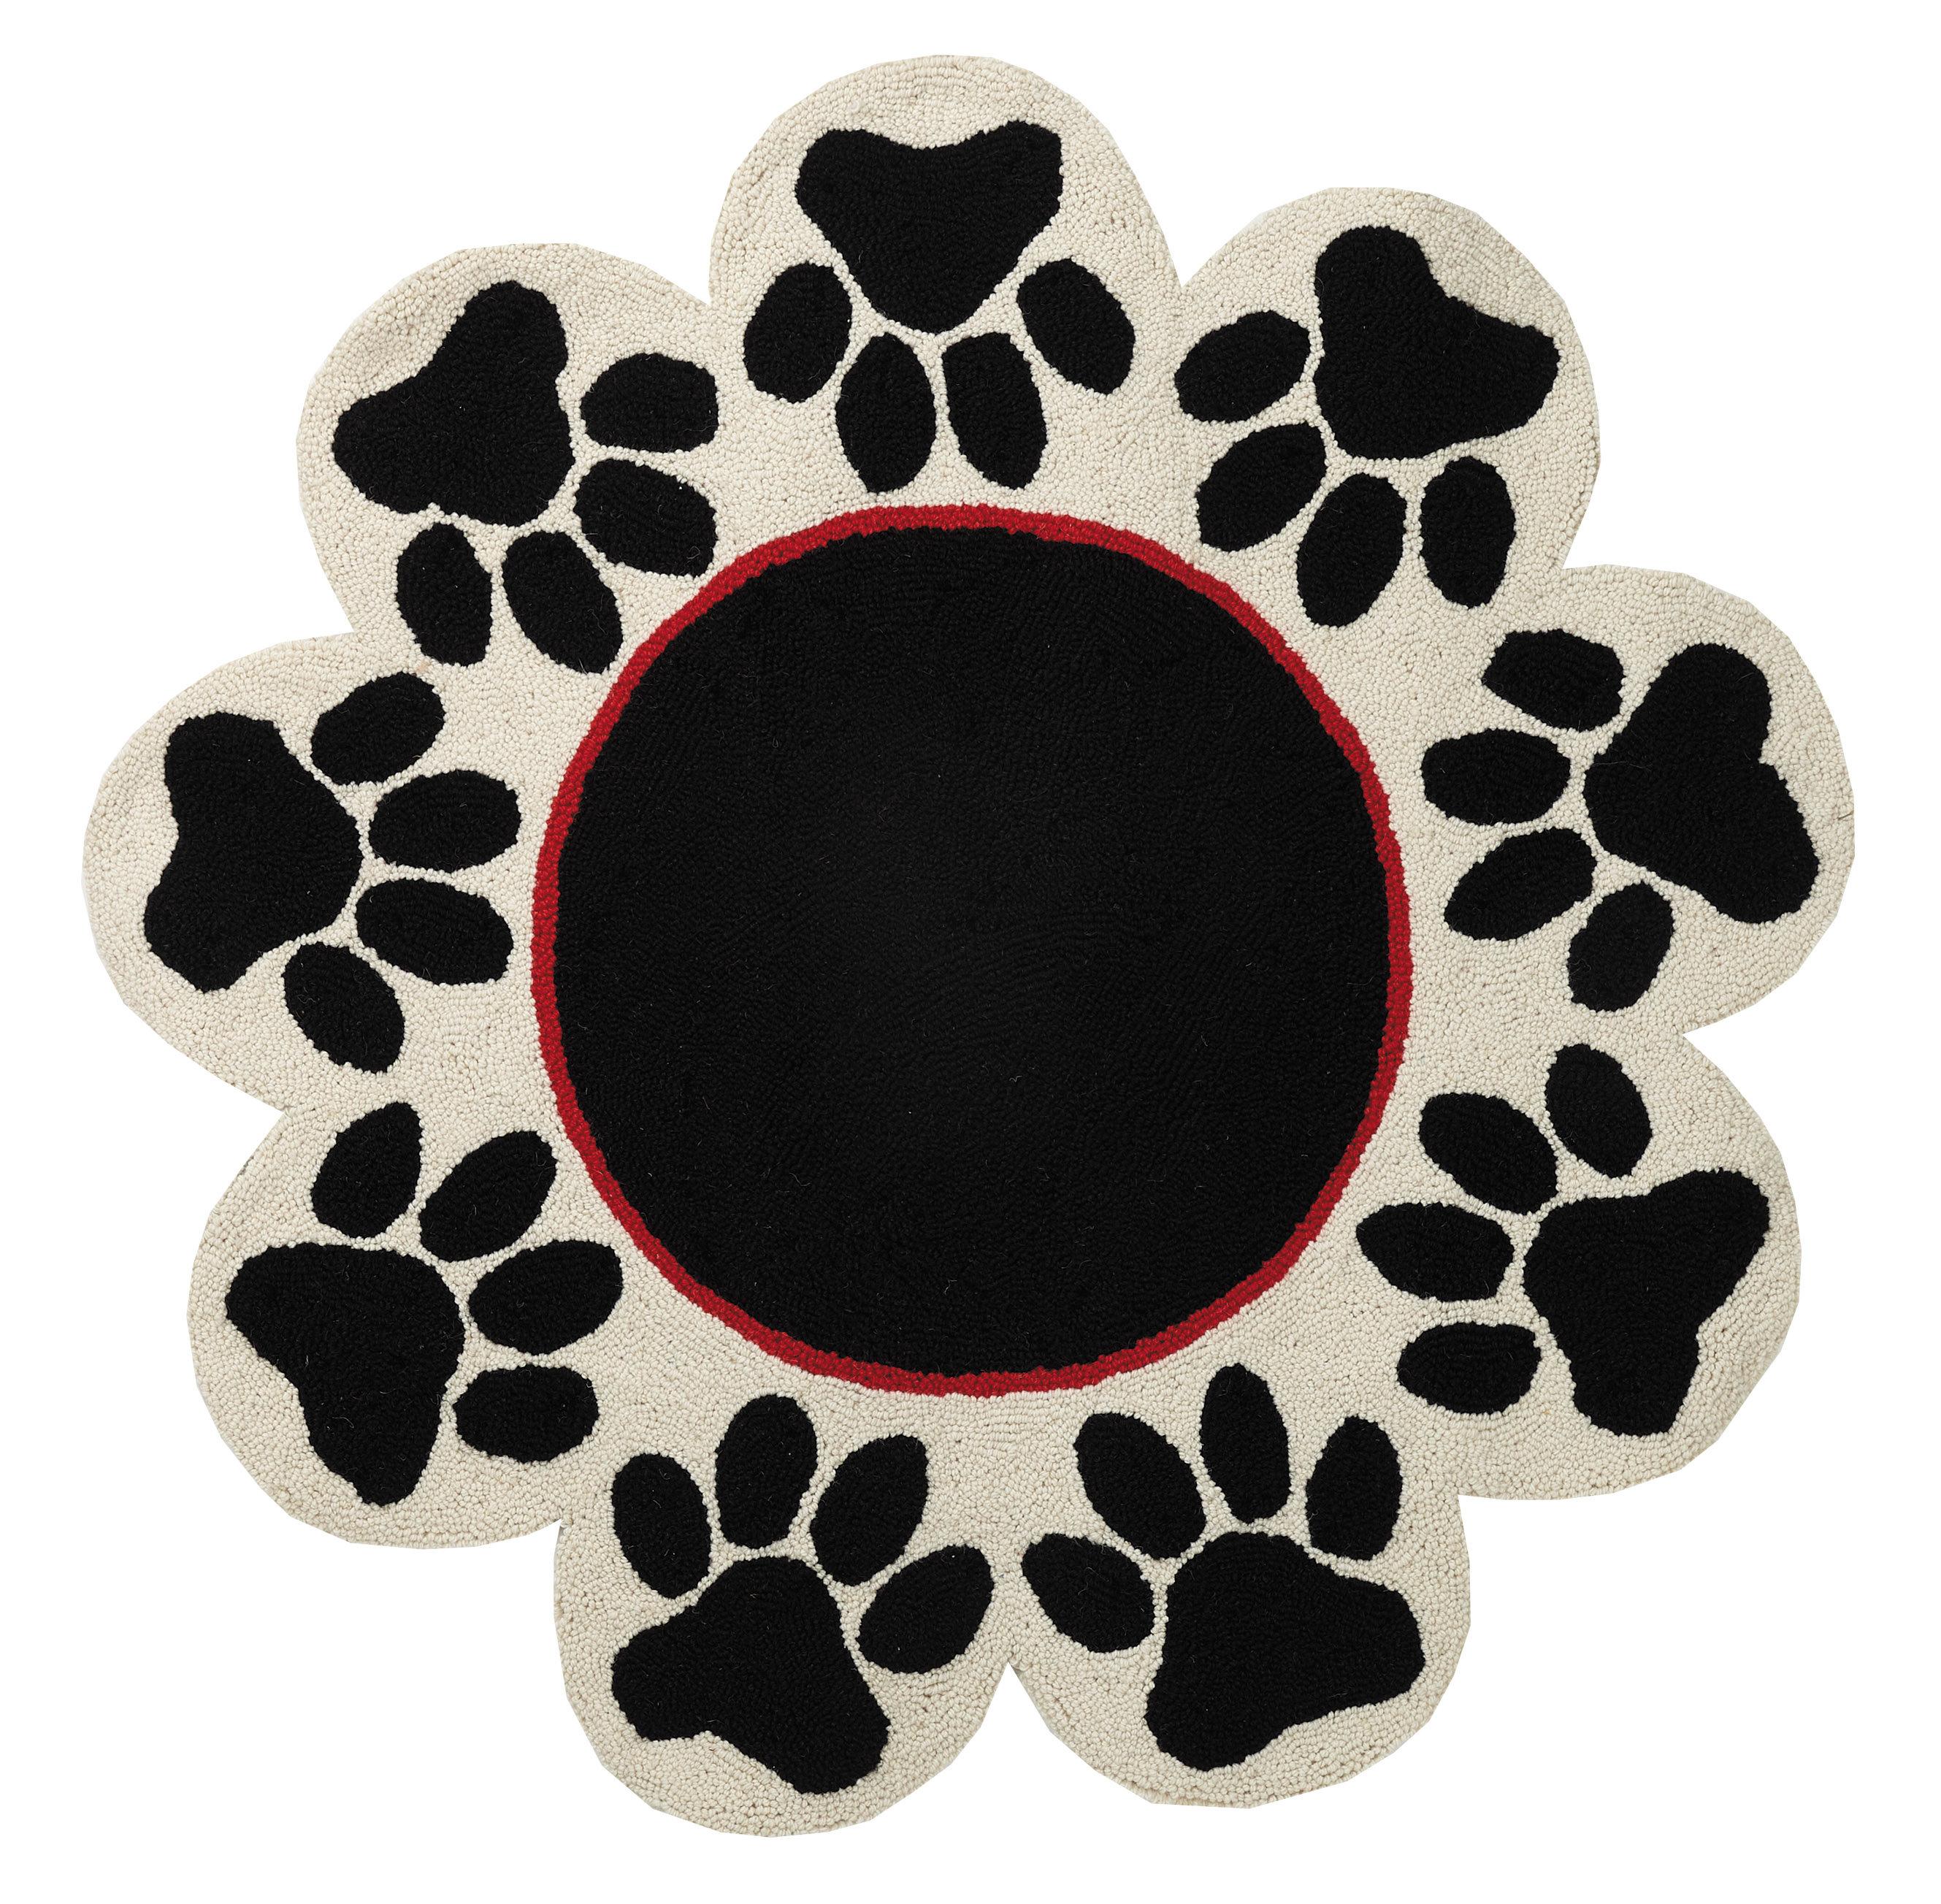 Rizo Paw Prints Round Shaped Hand Hooked Wool Black White Area Rug